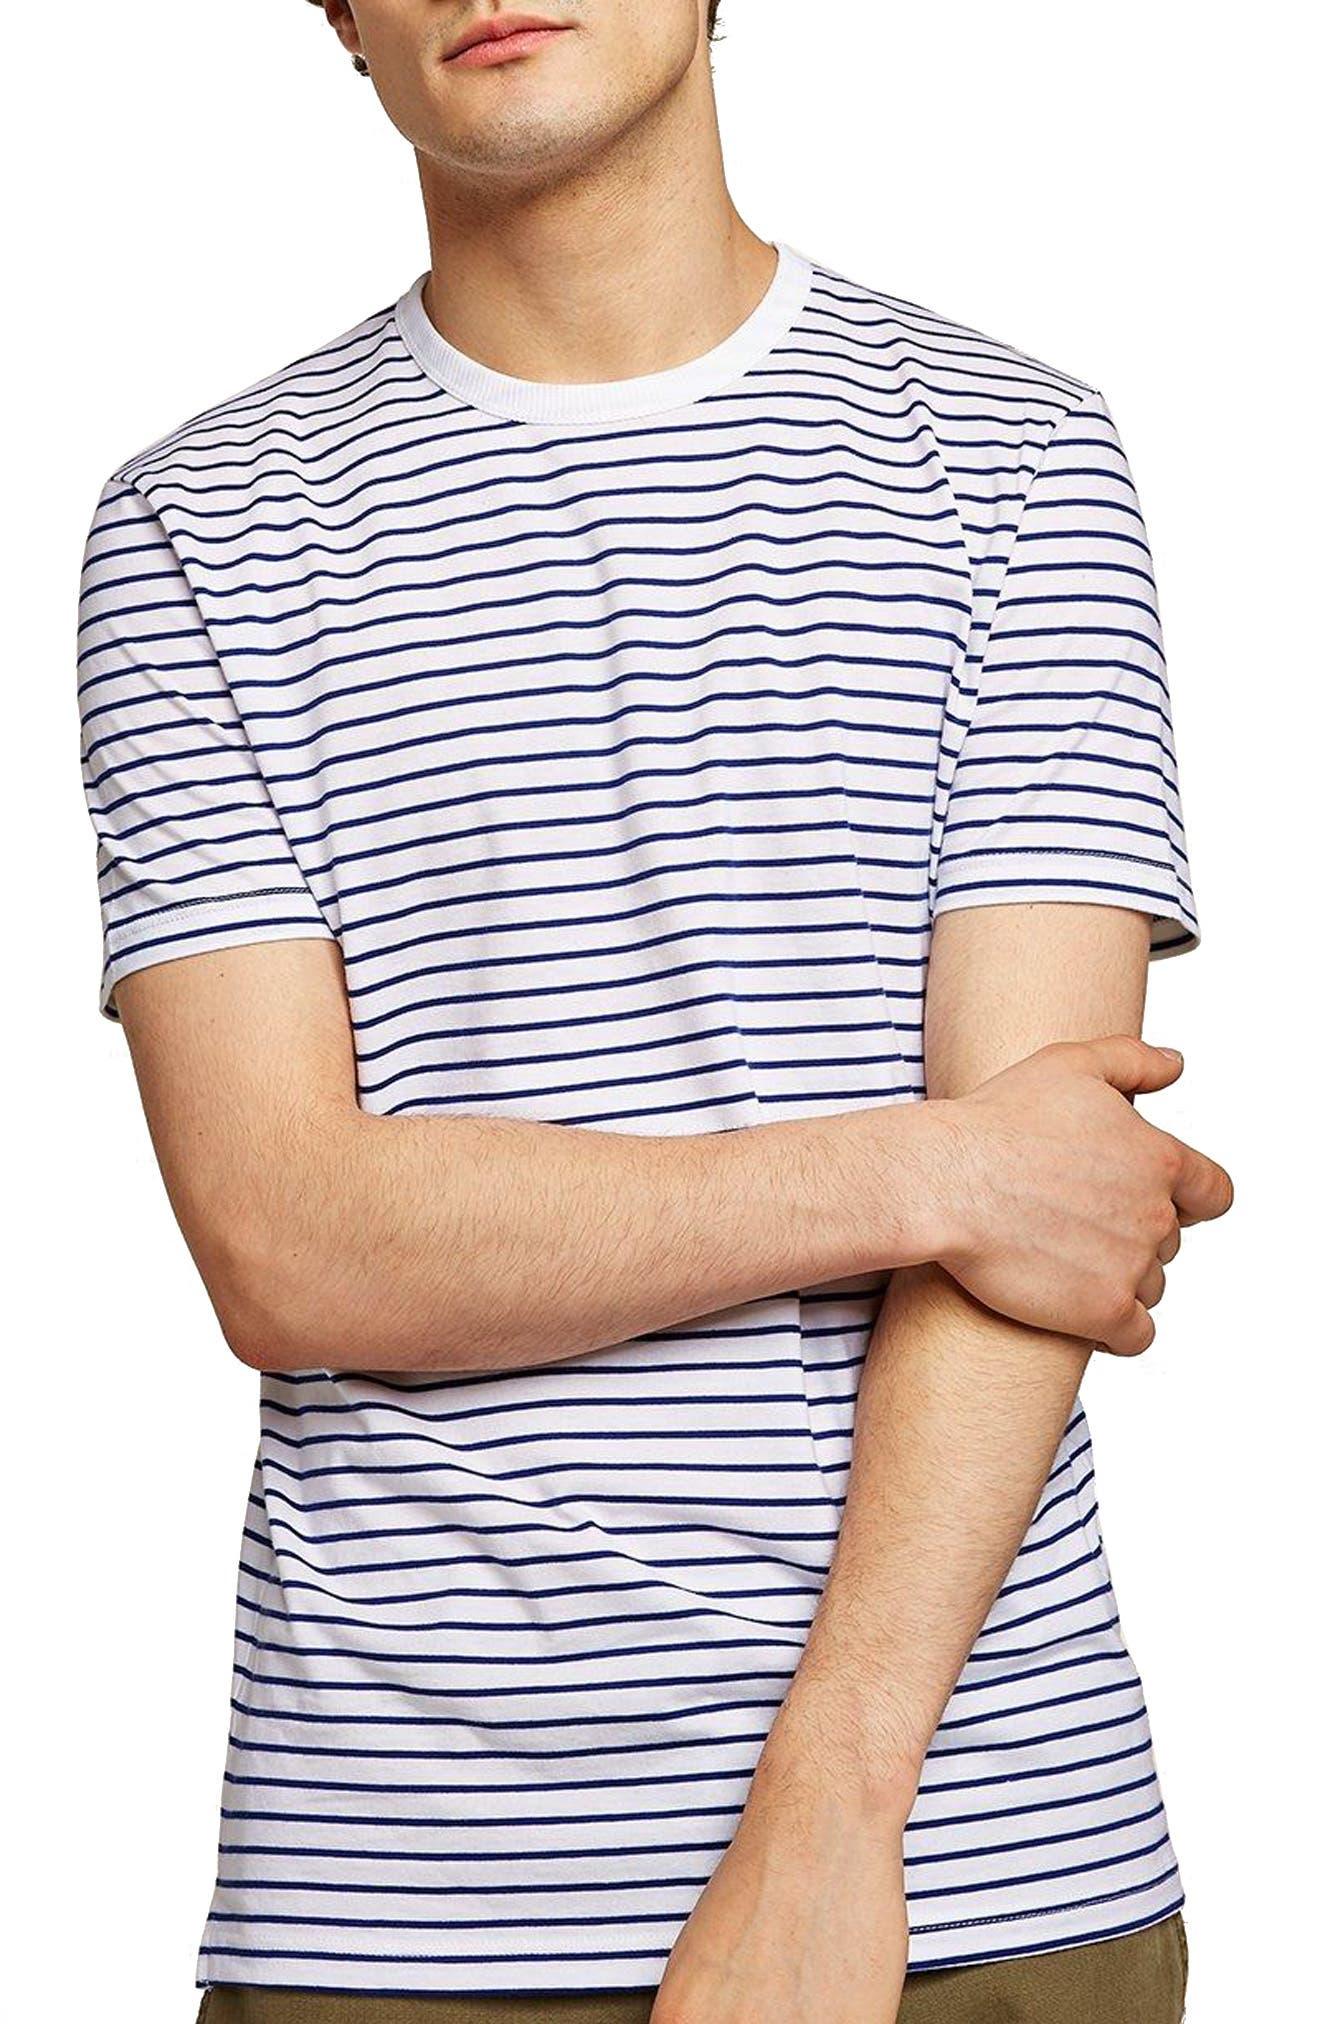 Slim Fit Stripe T-Shirt,                             Main thumbnail 1, color,                             DARK BLUE MULTI